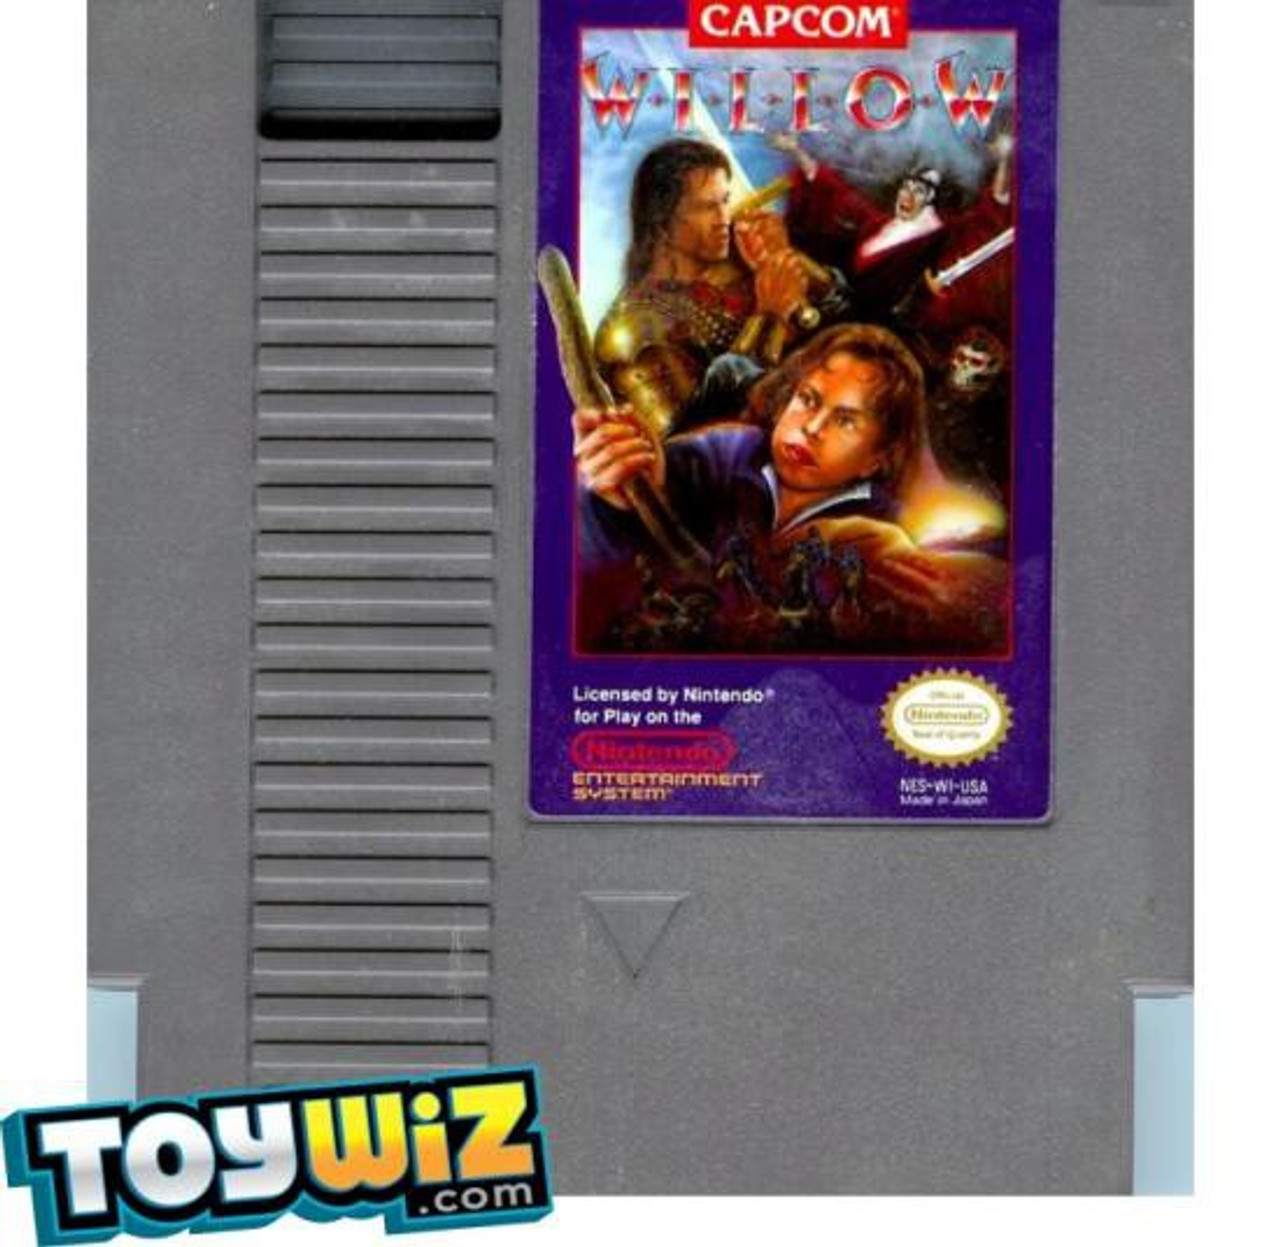 Capcom Nintendo NES Willow Video Game Cartridge [Played Condition]